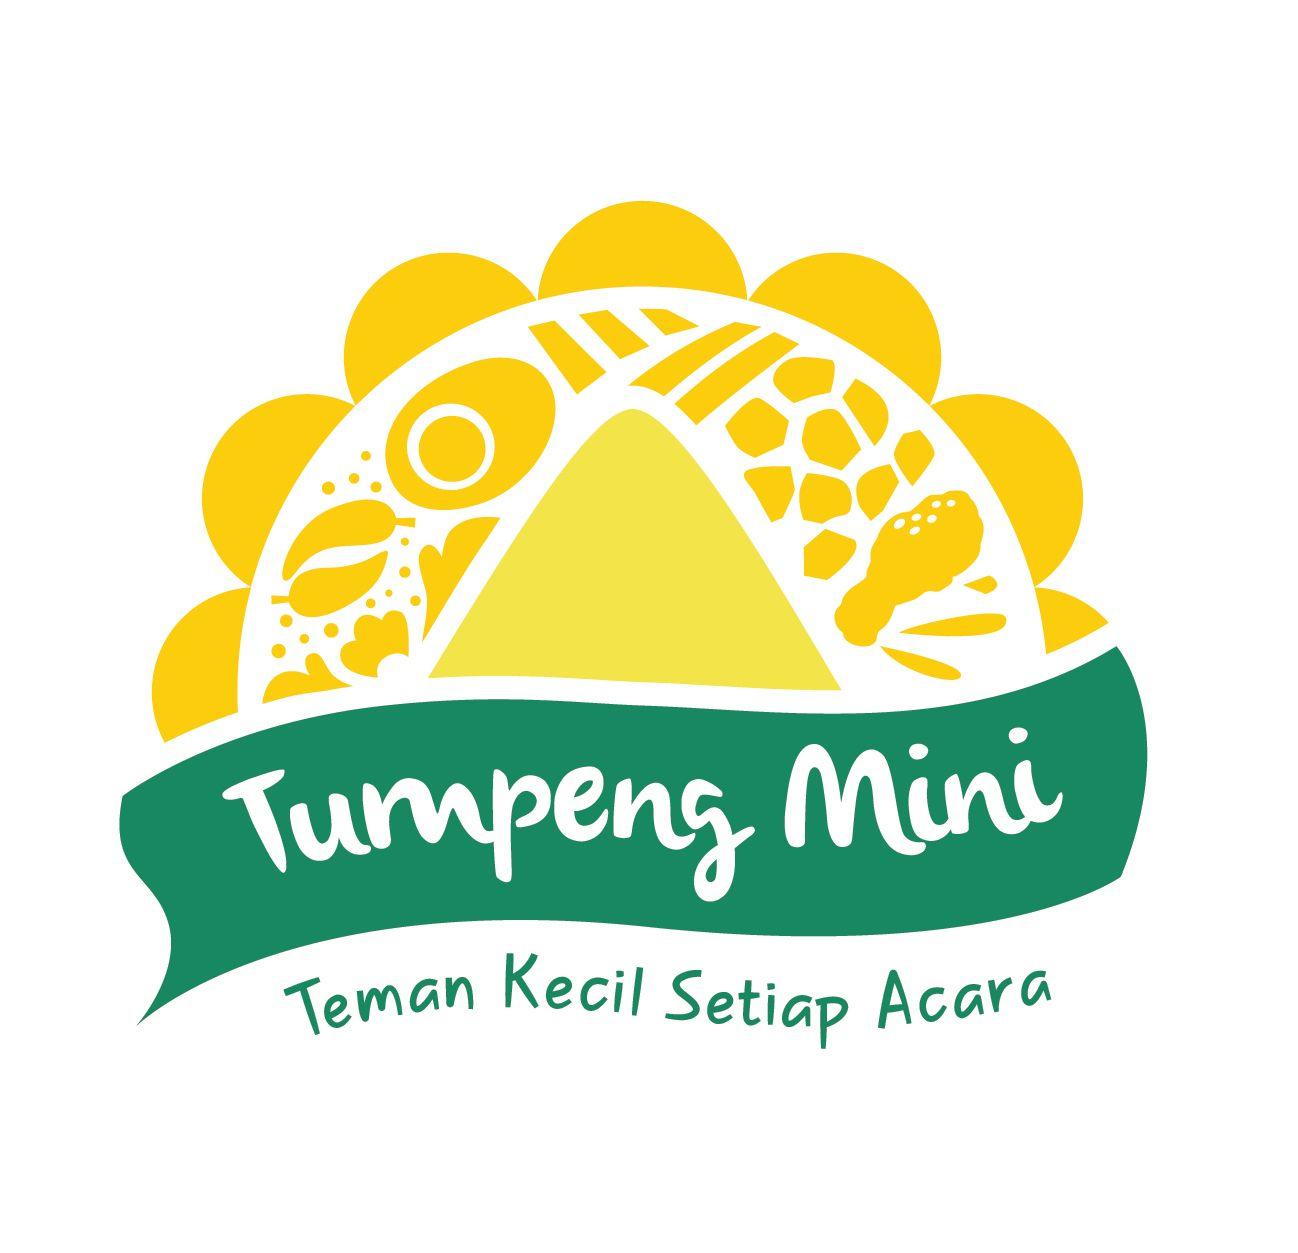 Tumpeng mini  Wedding Catering in Jakarta  Bridestorycom